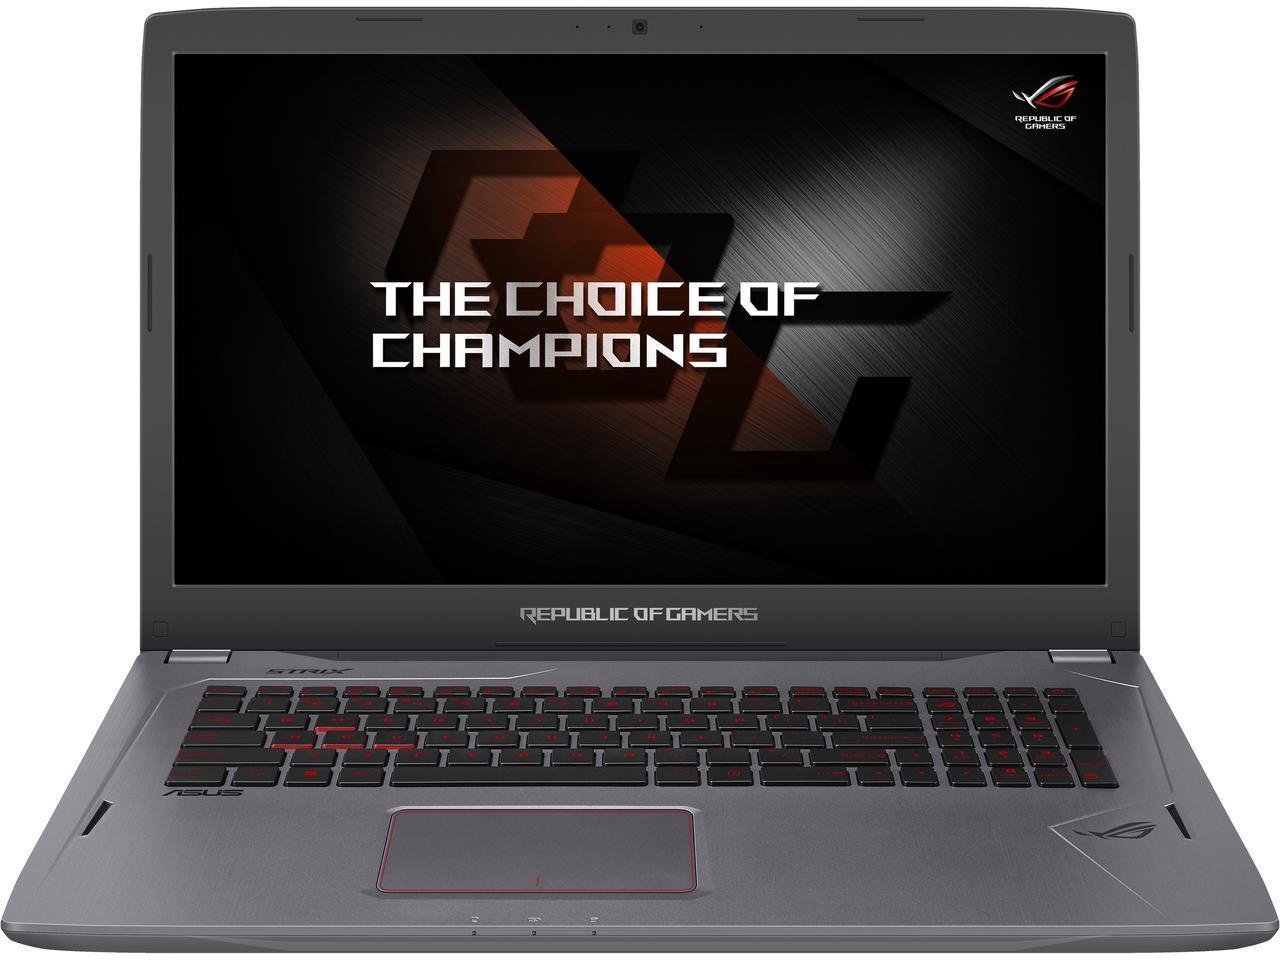 Asus ROG Strix GL702VS-AH73 Gaming Laptop: 17 3'' FHD 75 Hz G-Sync